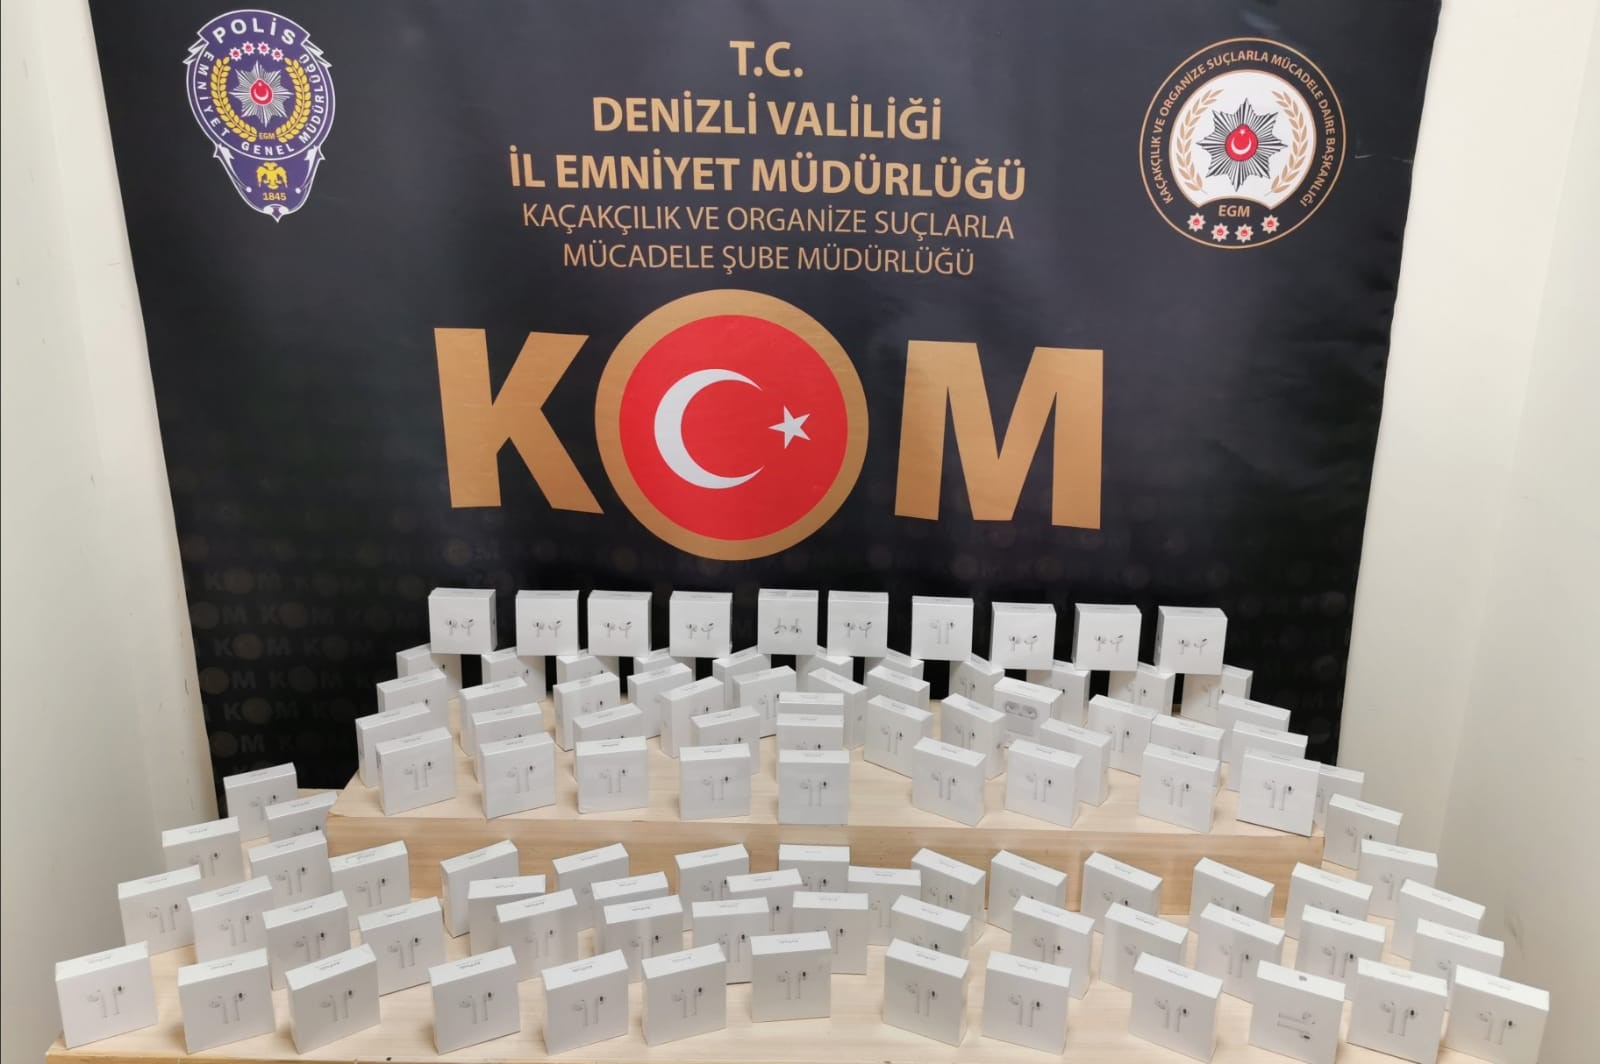 kom 3 - DENİZLİ'DE SAHTE 100 TL'LİK BANKNOTLAR YAKALANDI